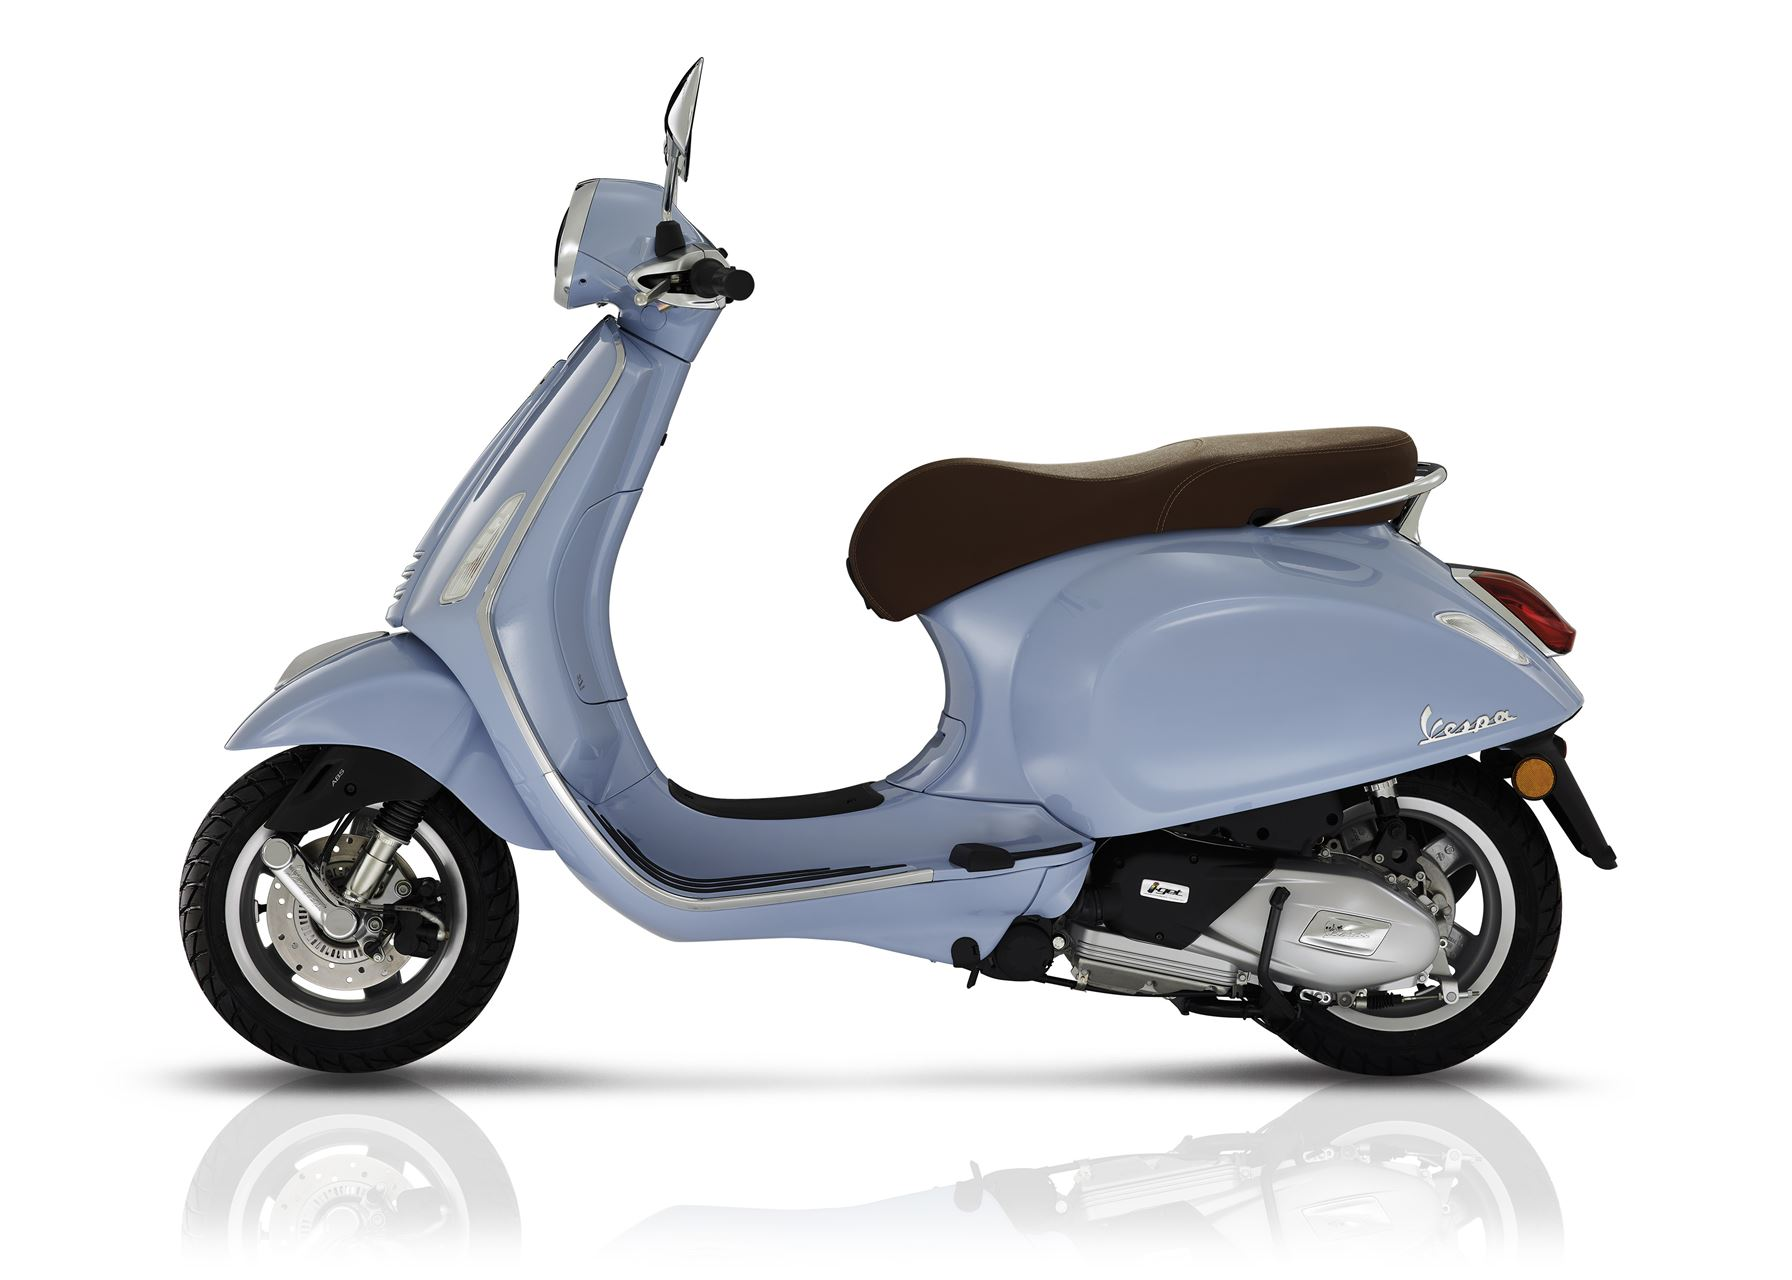 vespa primavera 125 scooter gama 125cc andar de moto. Black Bedroom Furniture Sets. Home Design Ideas